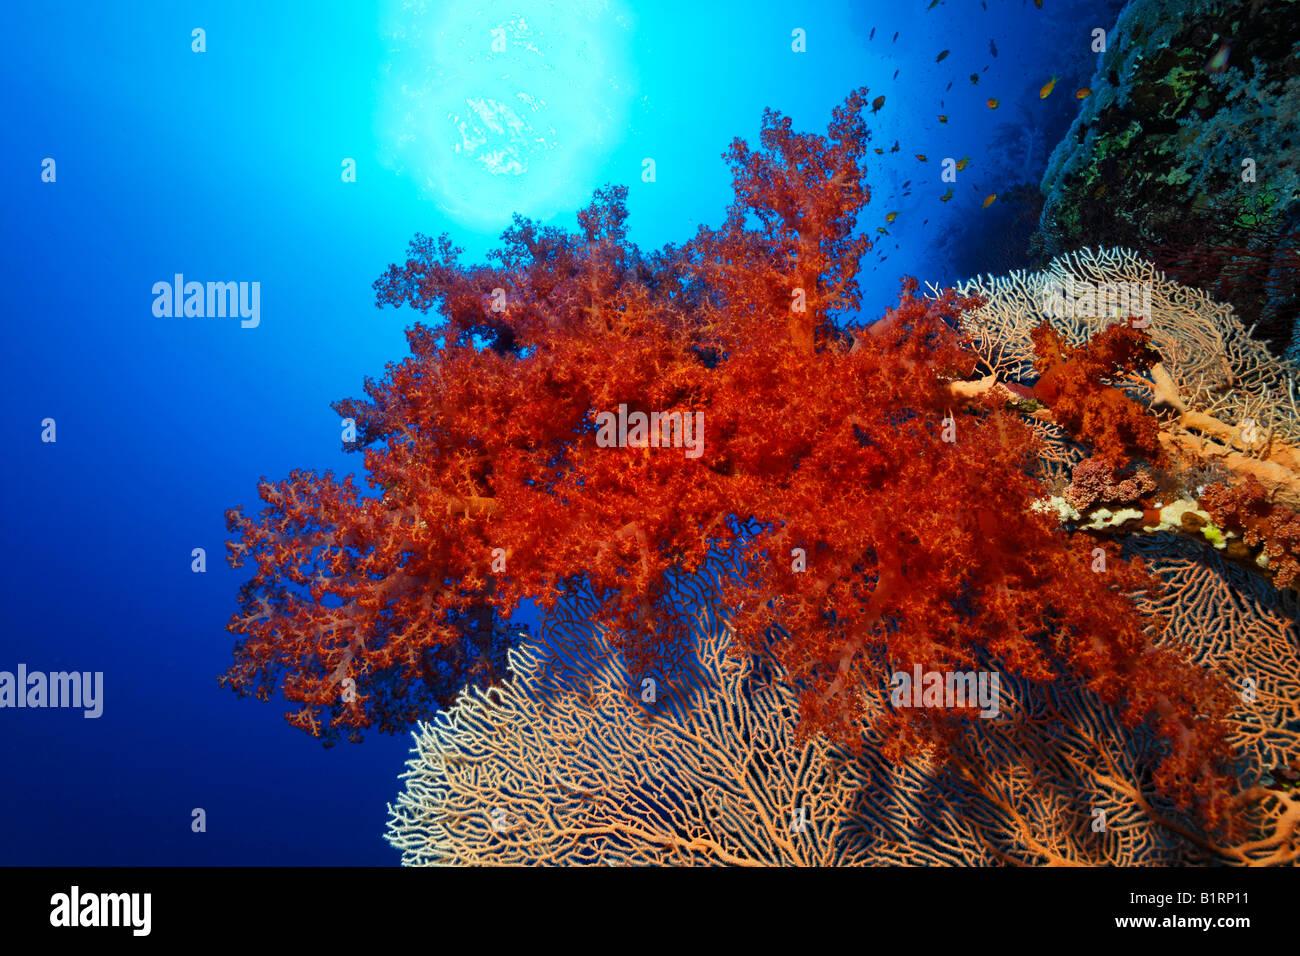 Red oceanic soft coral settled on a Sea Fan or Gorgonian (Gorgonacea), Hurghada, Sharm el Sheik, Red Sea, Egypt, - Stock Image